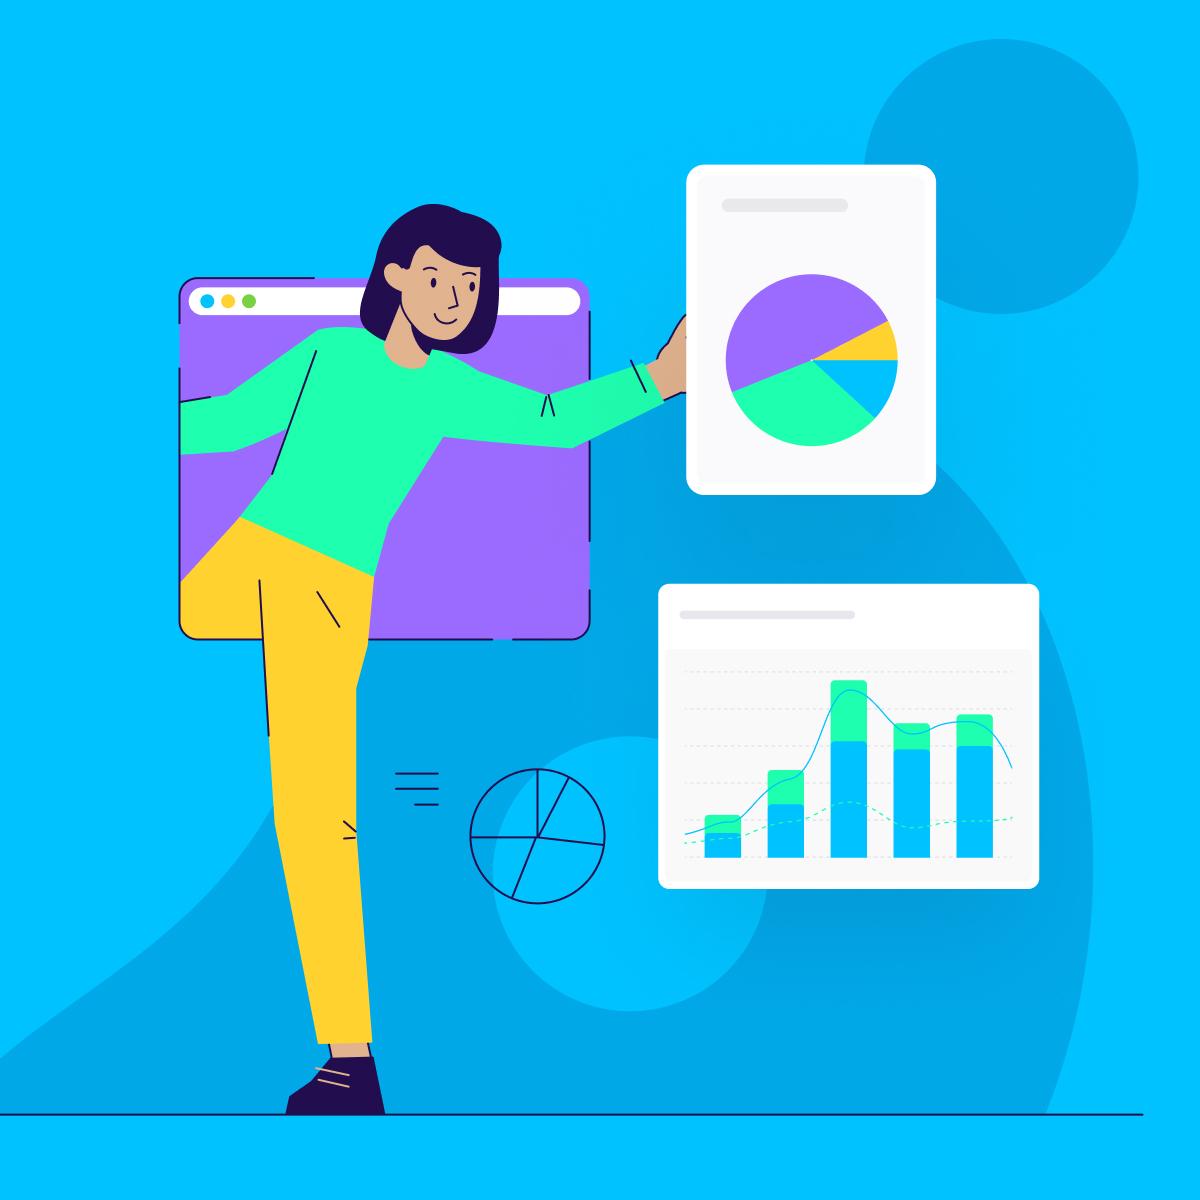 cohort analysis data insights - square